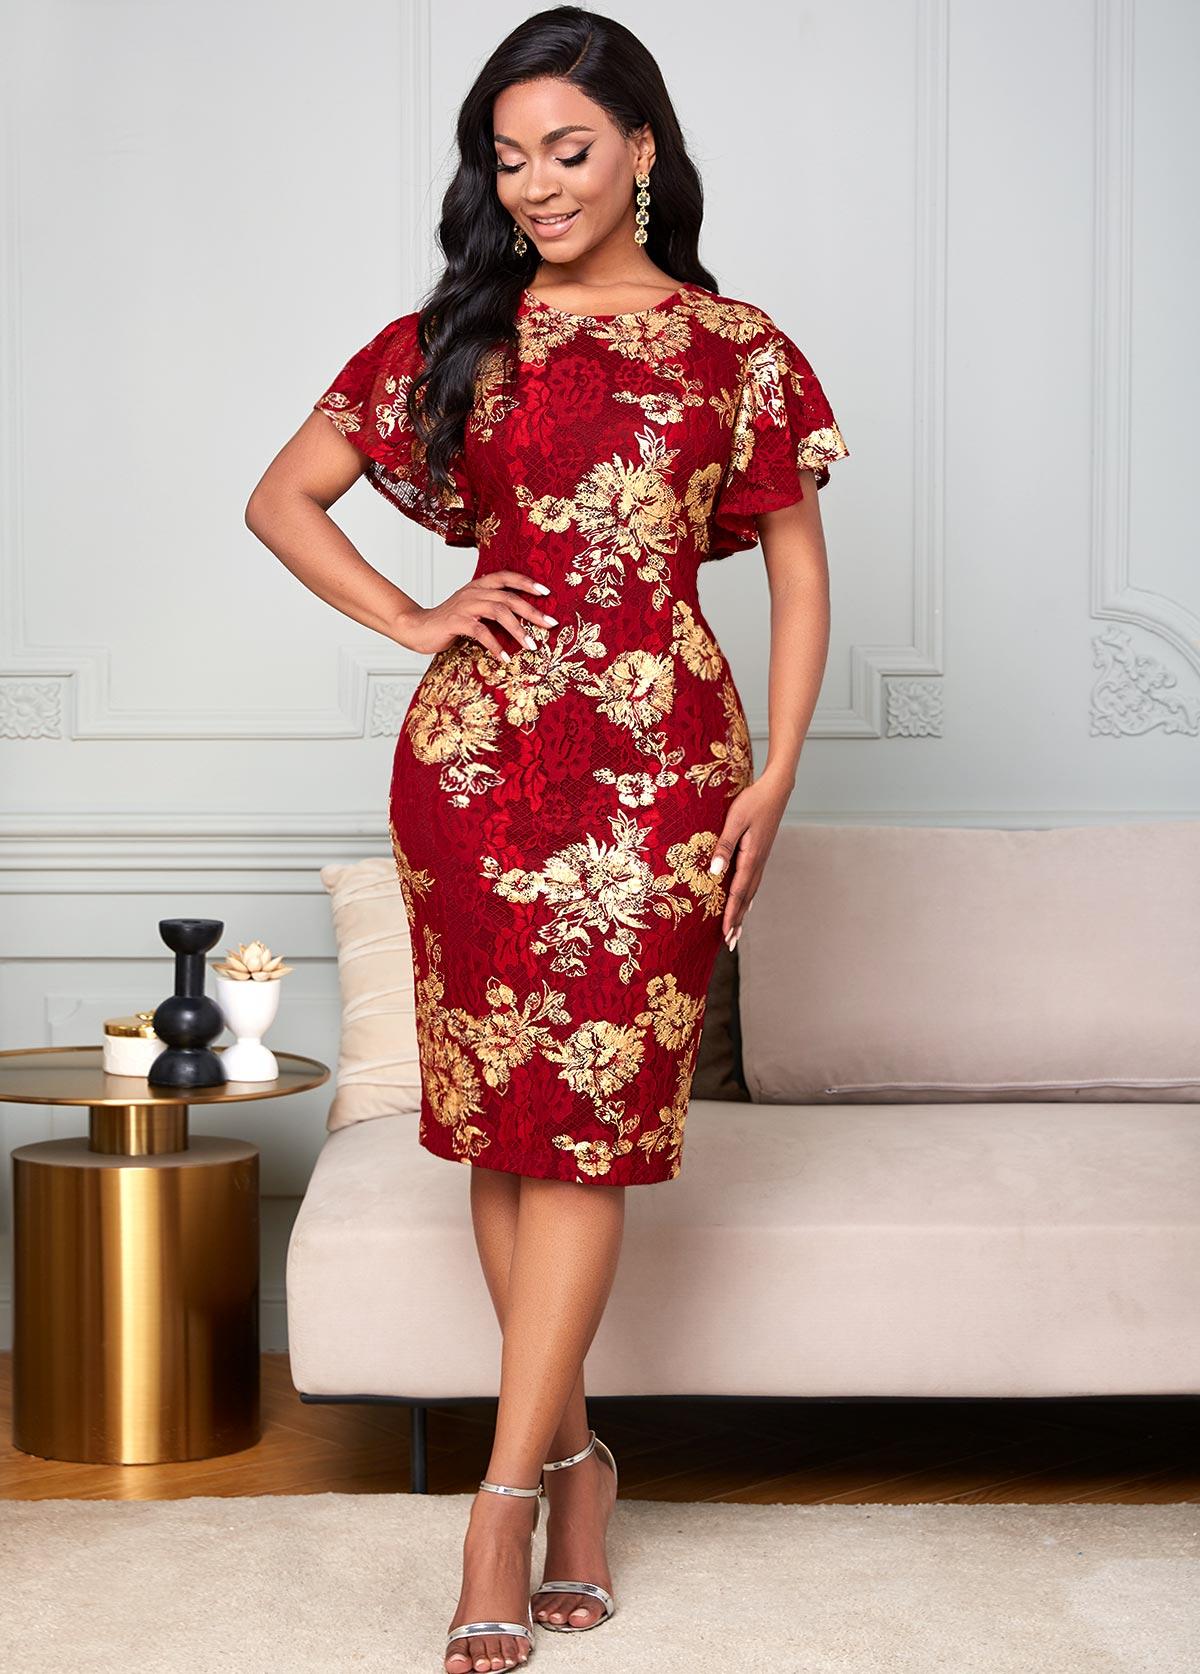 ROTITA Embroidered Mesh Stitching Round Neck Lace Dress